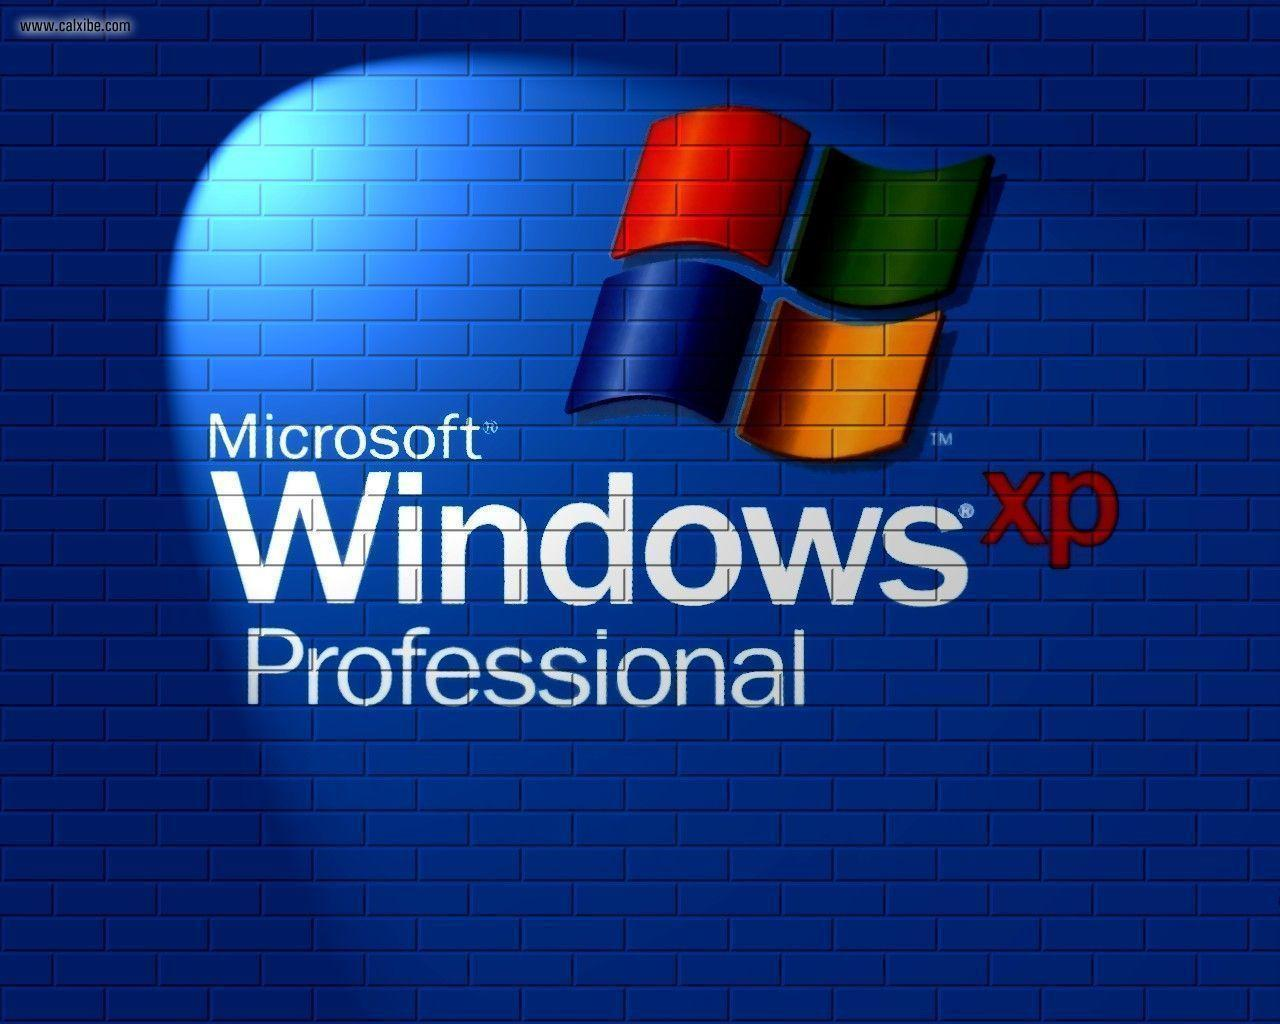 xp professional logo system - photo #11